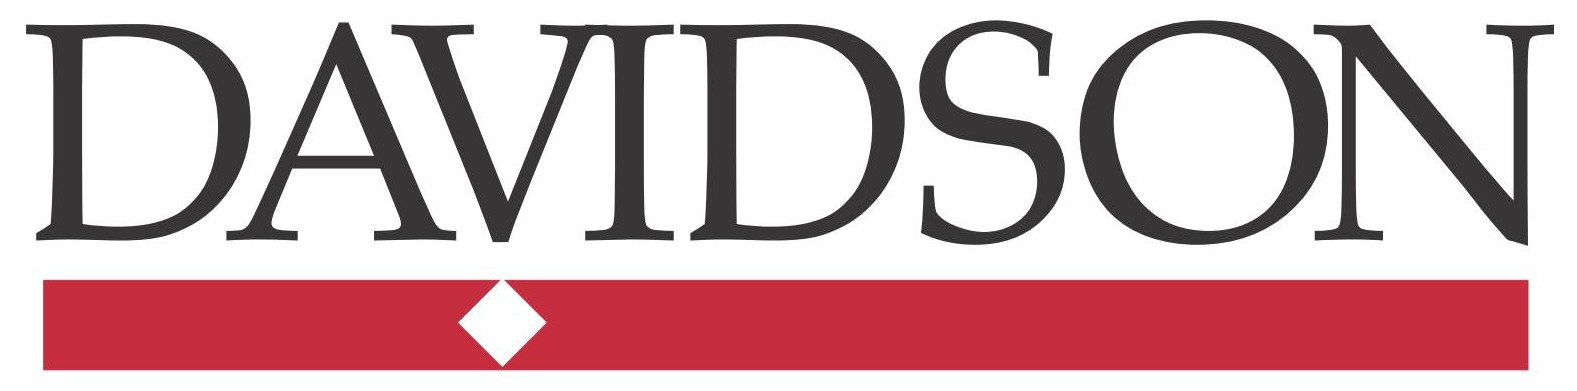 Davidson College Logo png